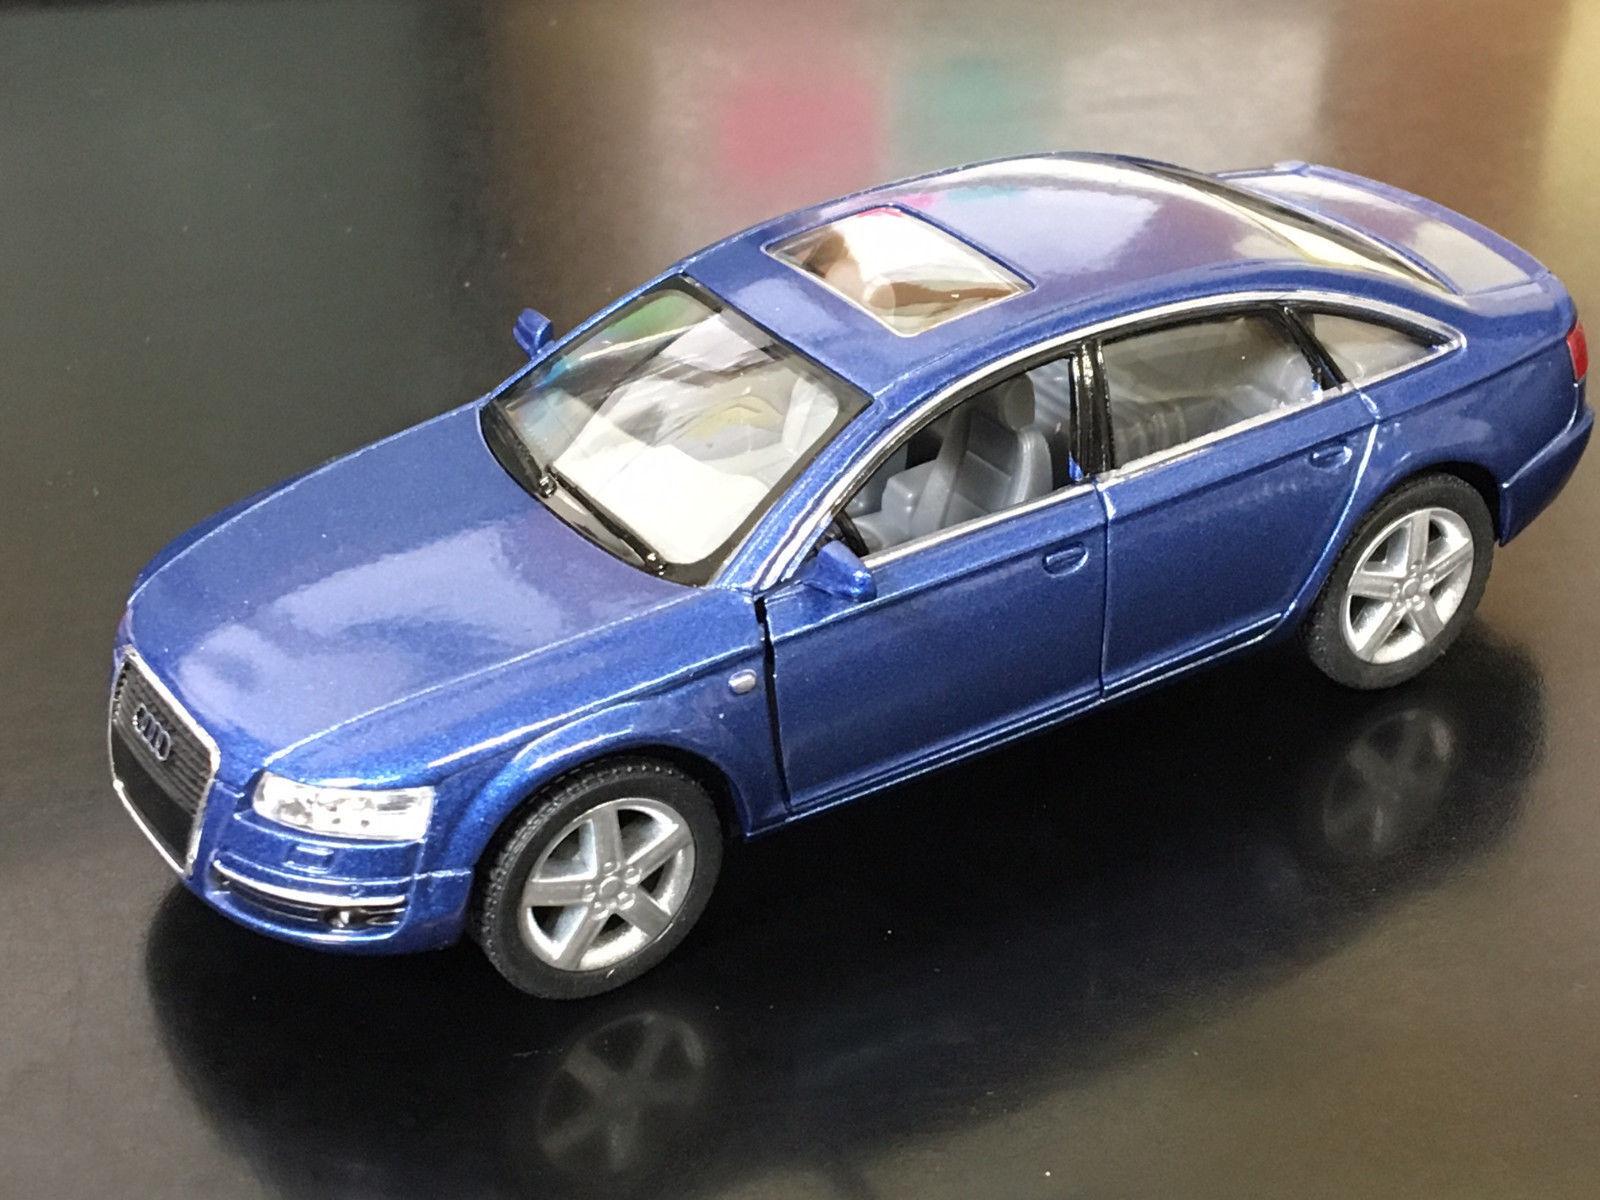 PC Set Kinsmart AUDI A Diecast Model Toy Car Scale Pull - Audi lowest model price